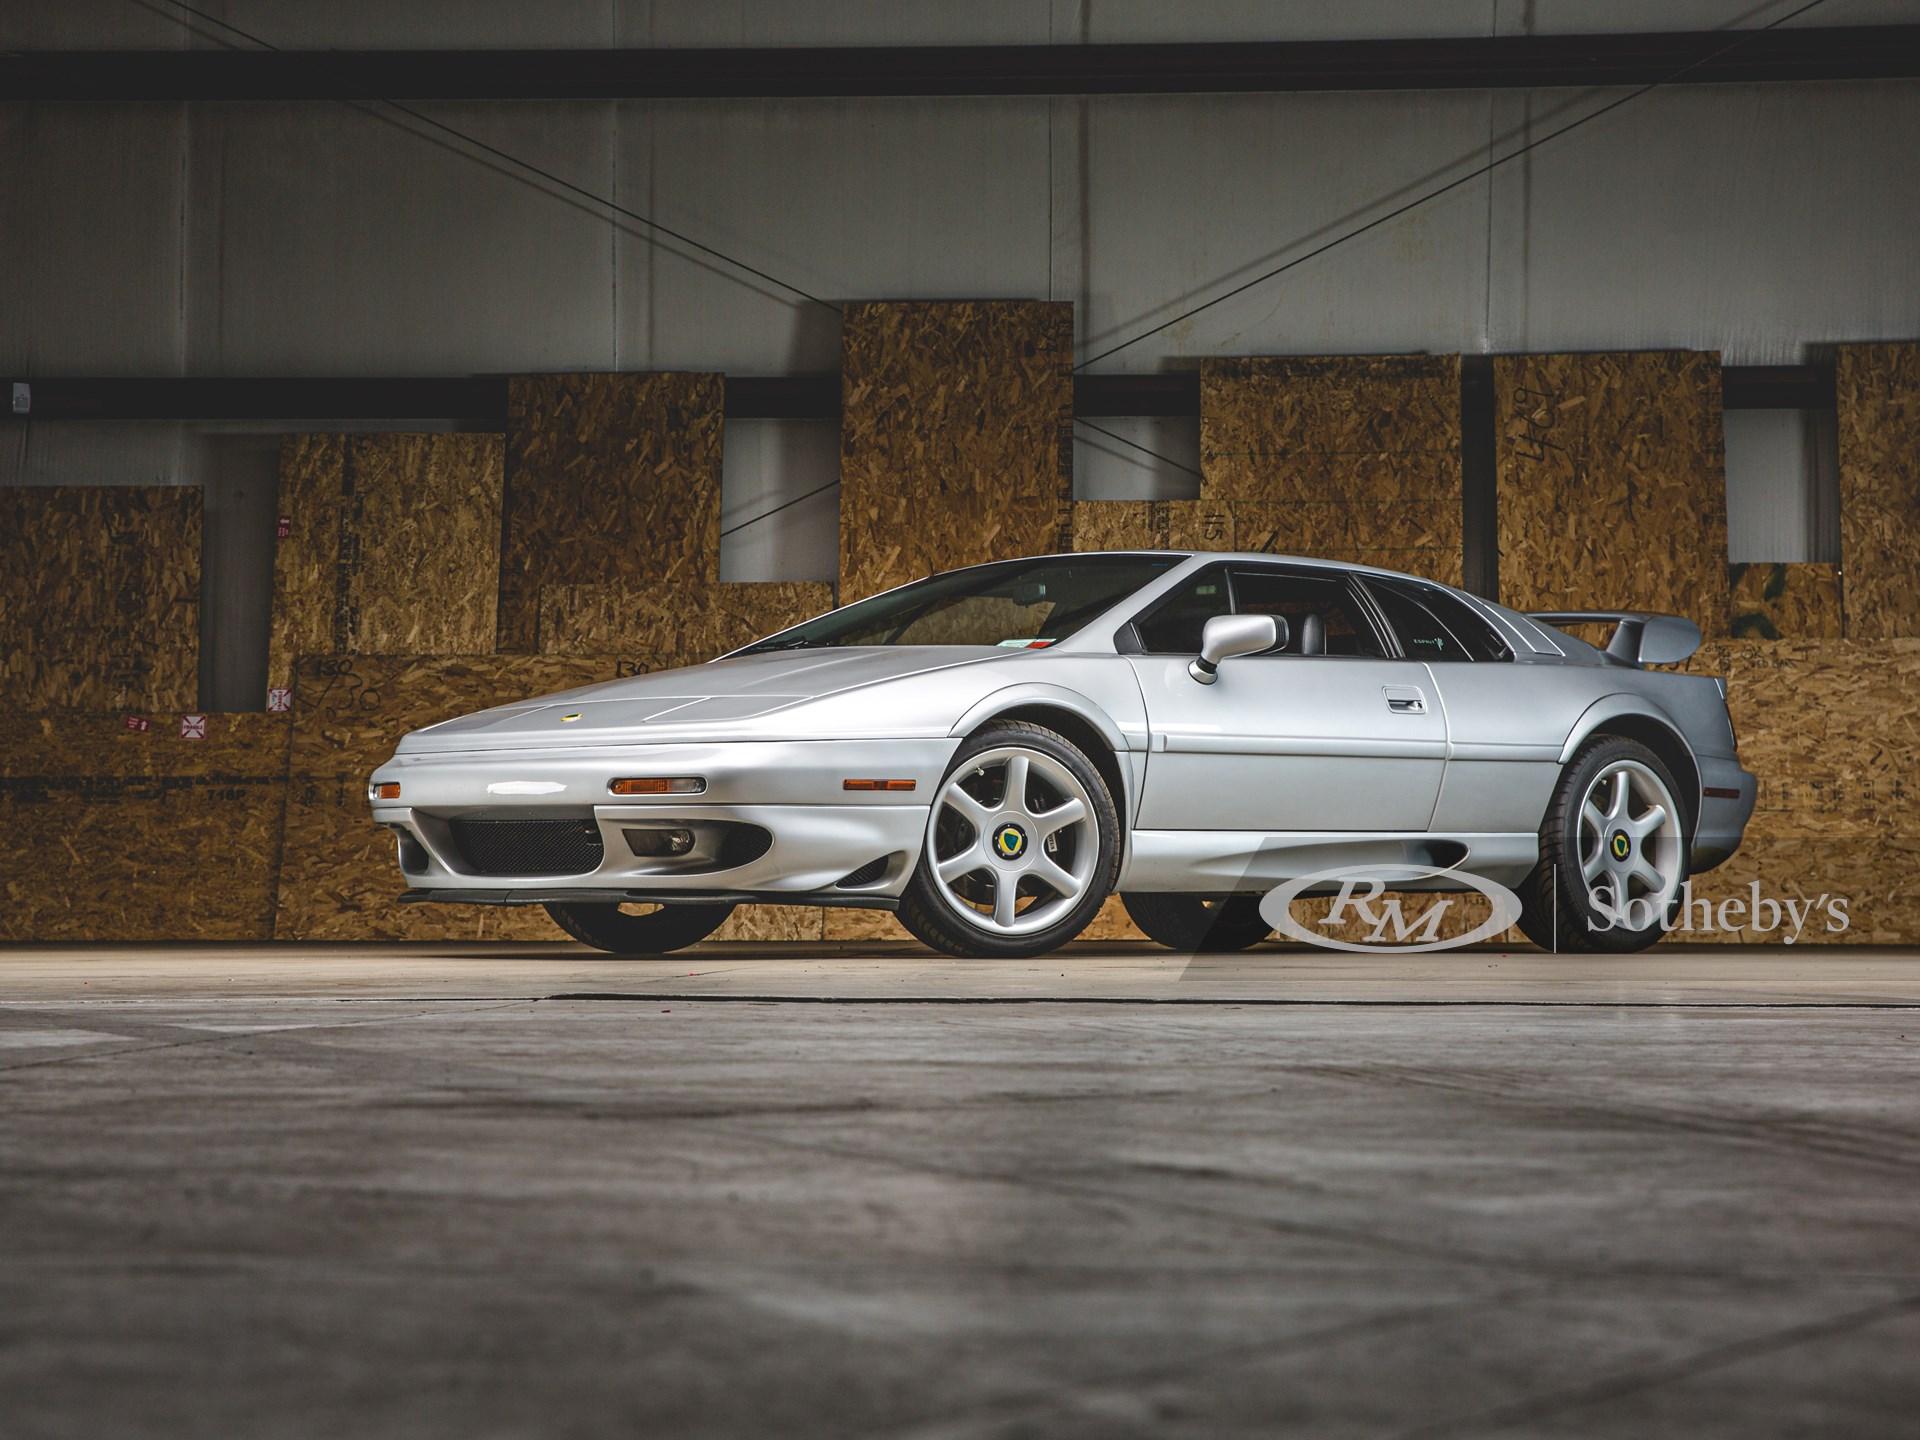 2001 Lotus Esprit V8 SE  -